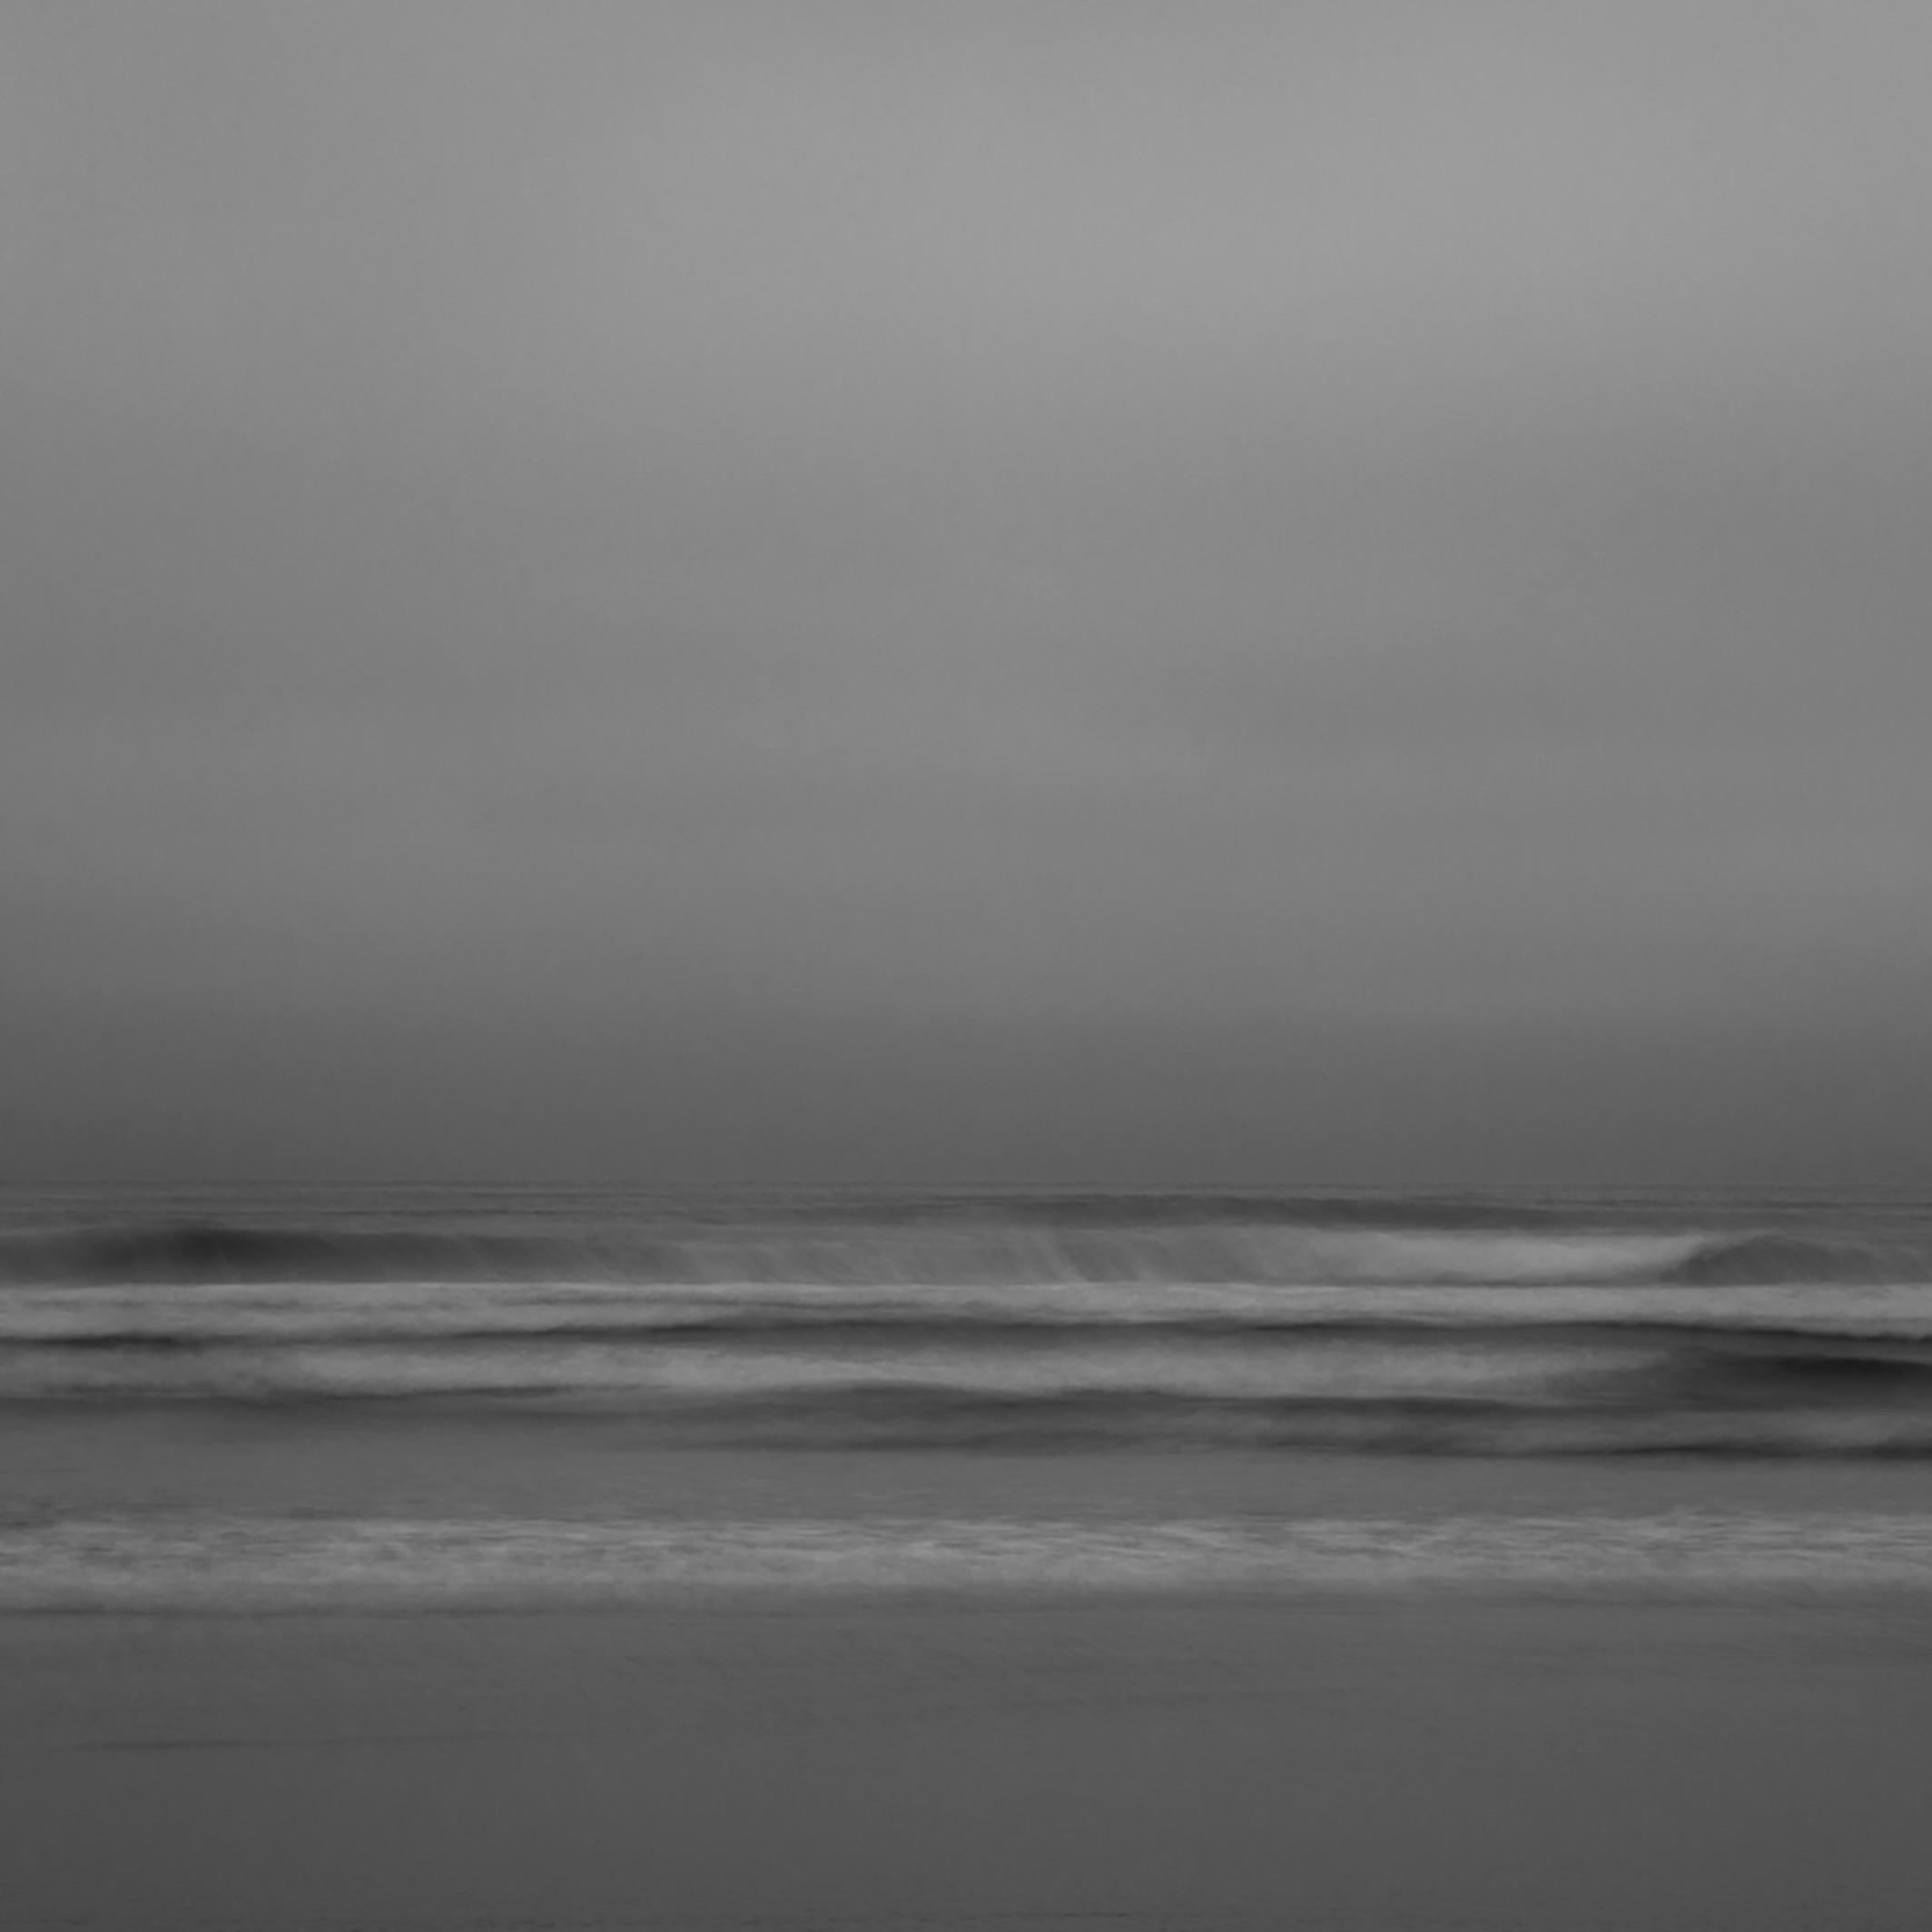 Pacific ocean kalaloch beach washington july 2013 huen7c